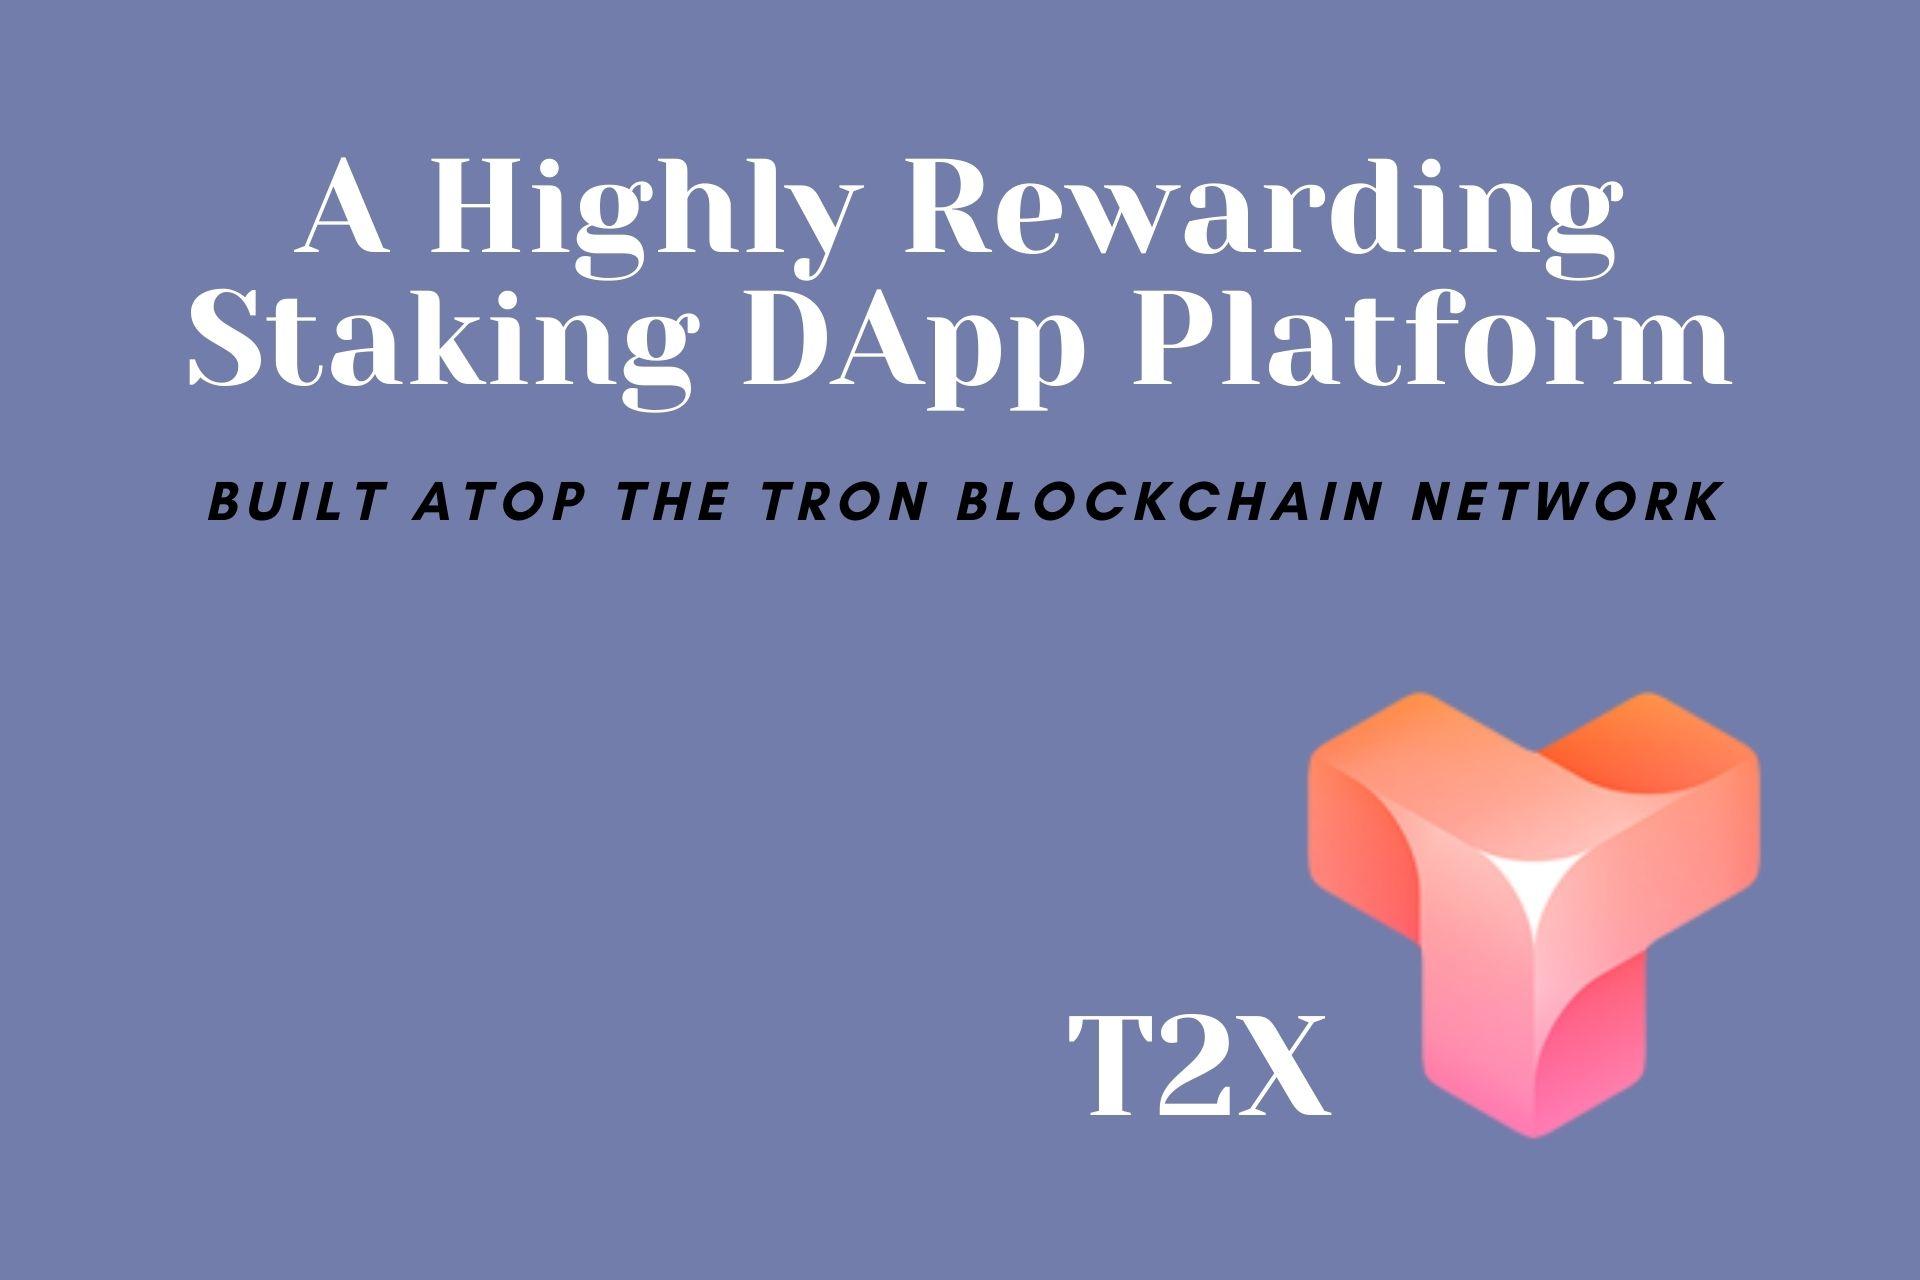 T2X – A Highly Rewarding Staking DApp Platform Built Atop the TRON Blockchain Network